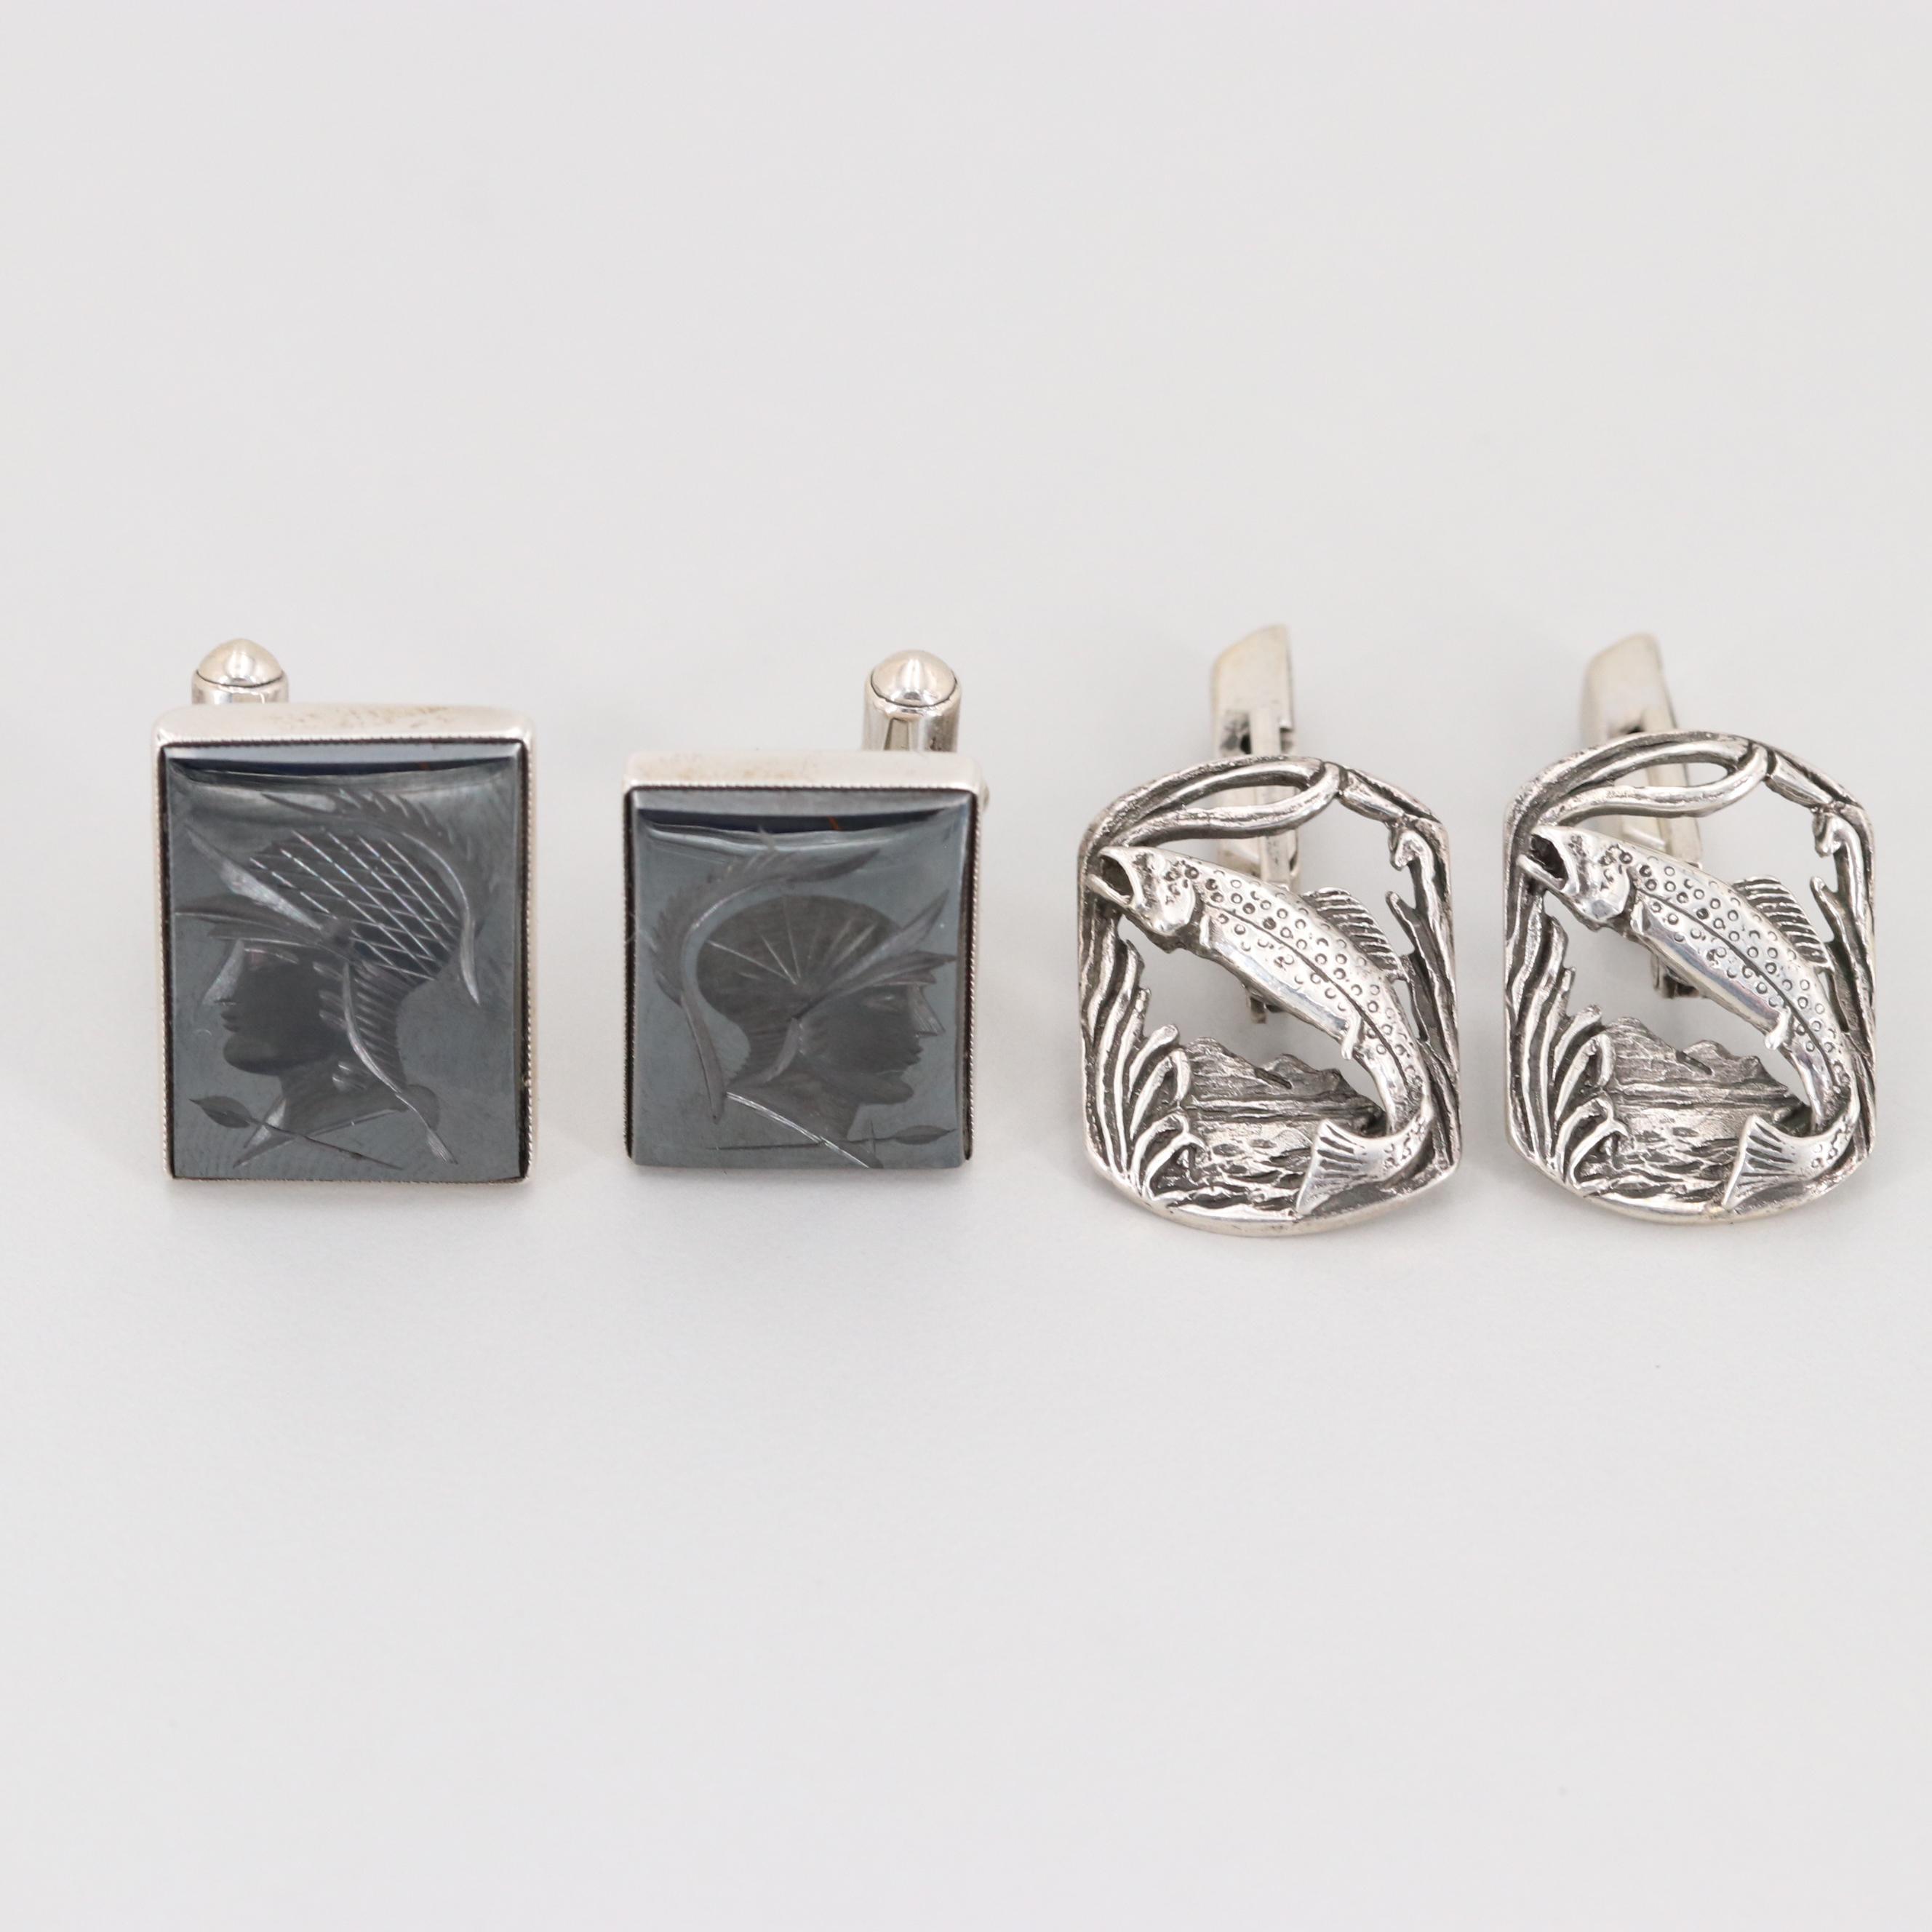 Sterling Silver Fishing Motif and Hematite Intaglio Cuff Links